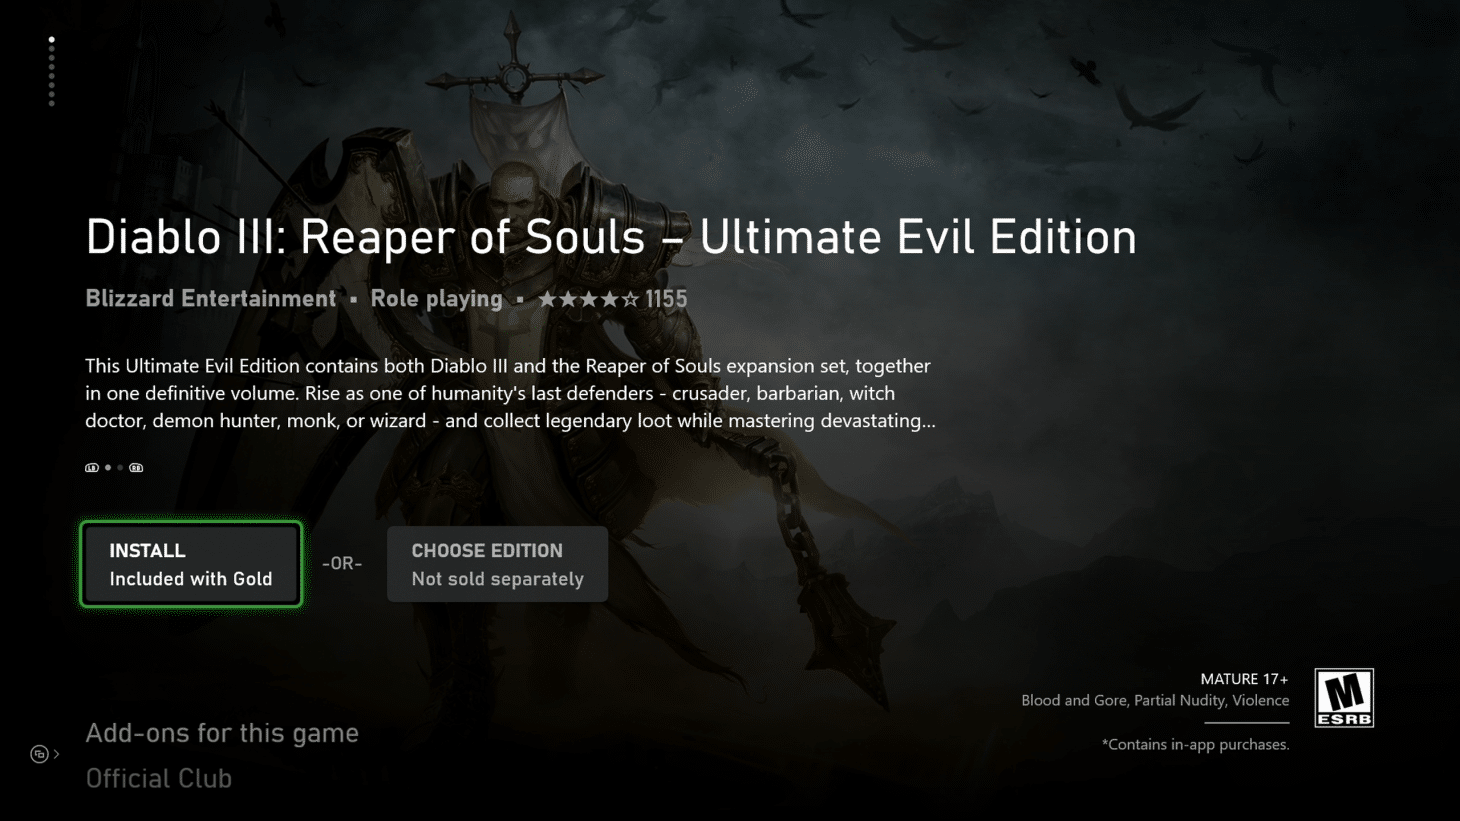 Diablo III: Reaper of Souls  Ultimate Evil внезапно стала бесплатной на Xbox для подписчиков Live Gold